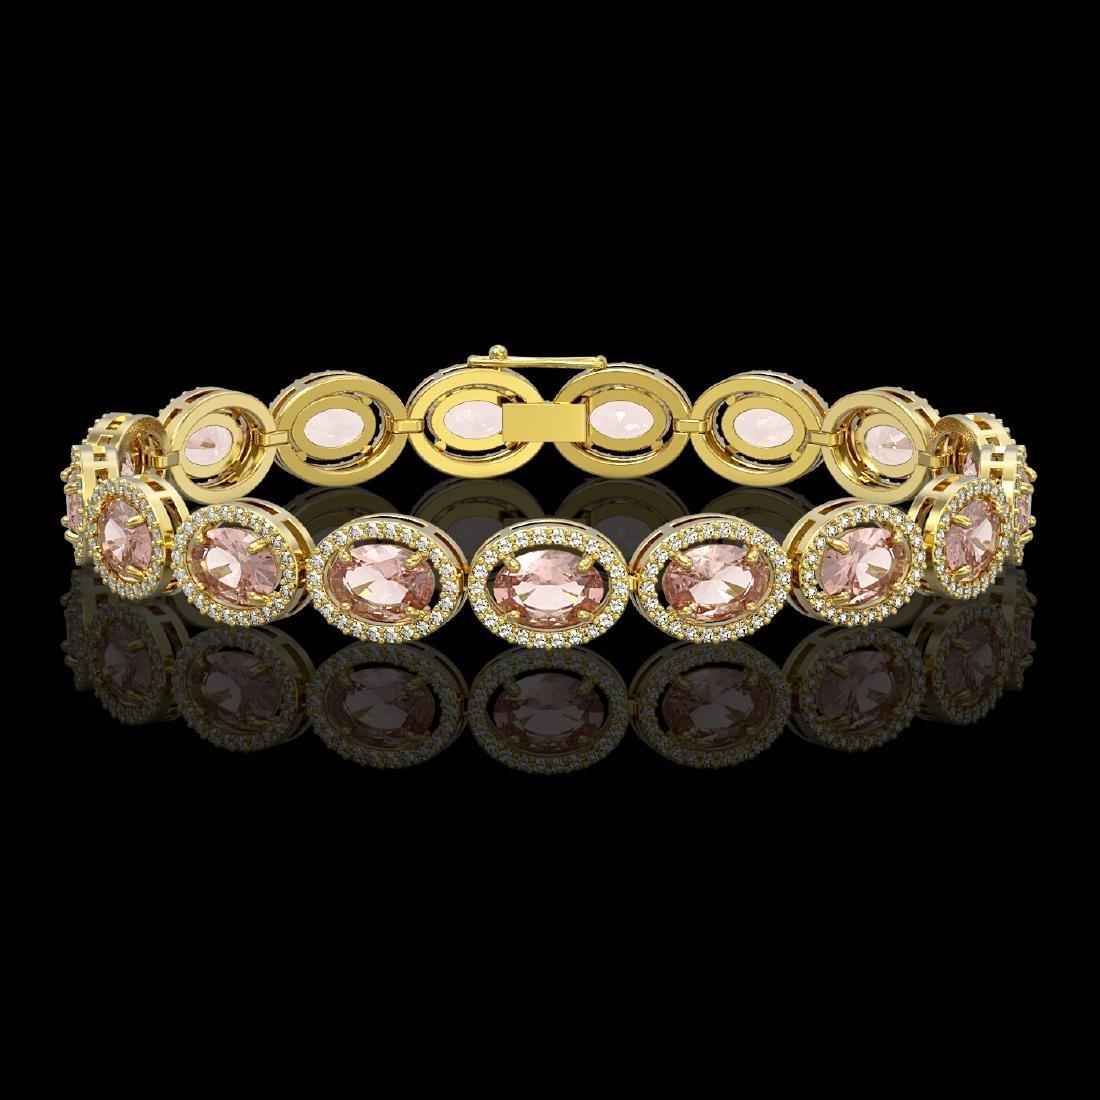 20.18 CTW Morganite & Diamond Halo Bracelet 10K Yellow